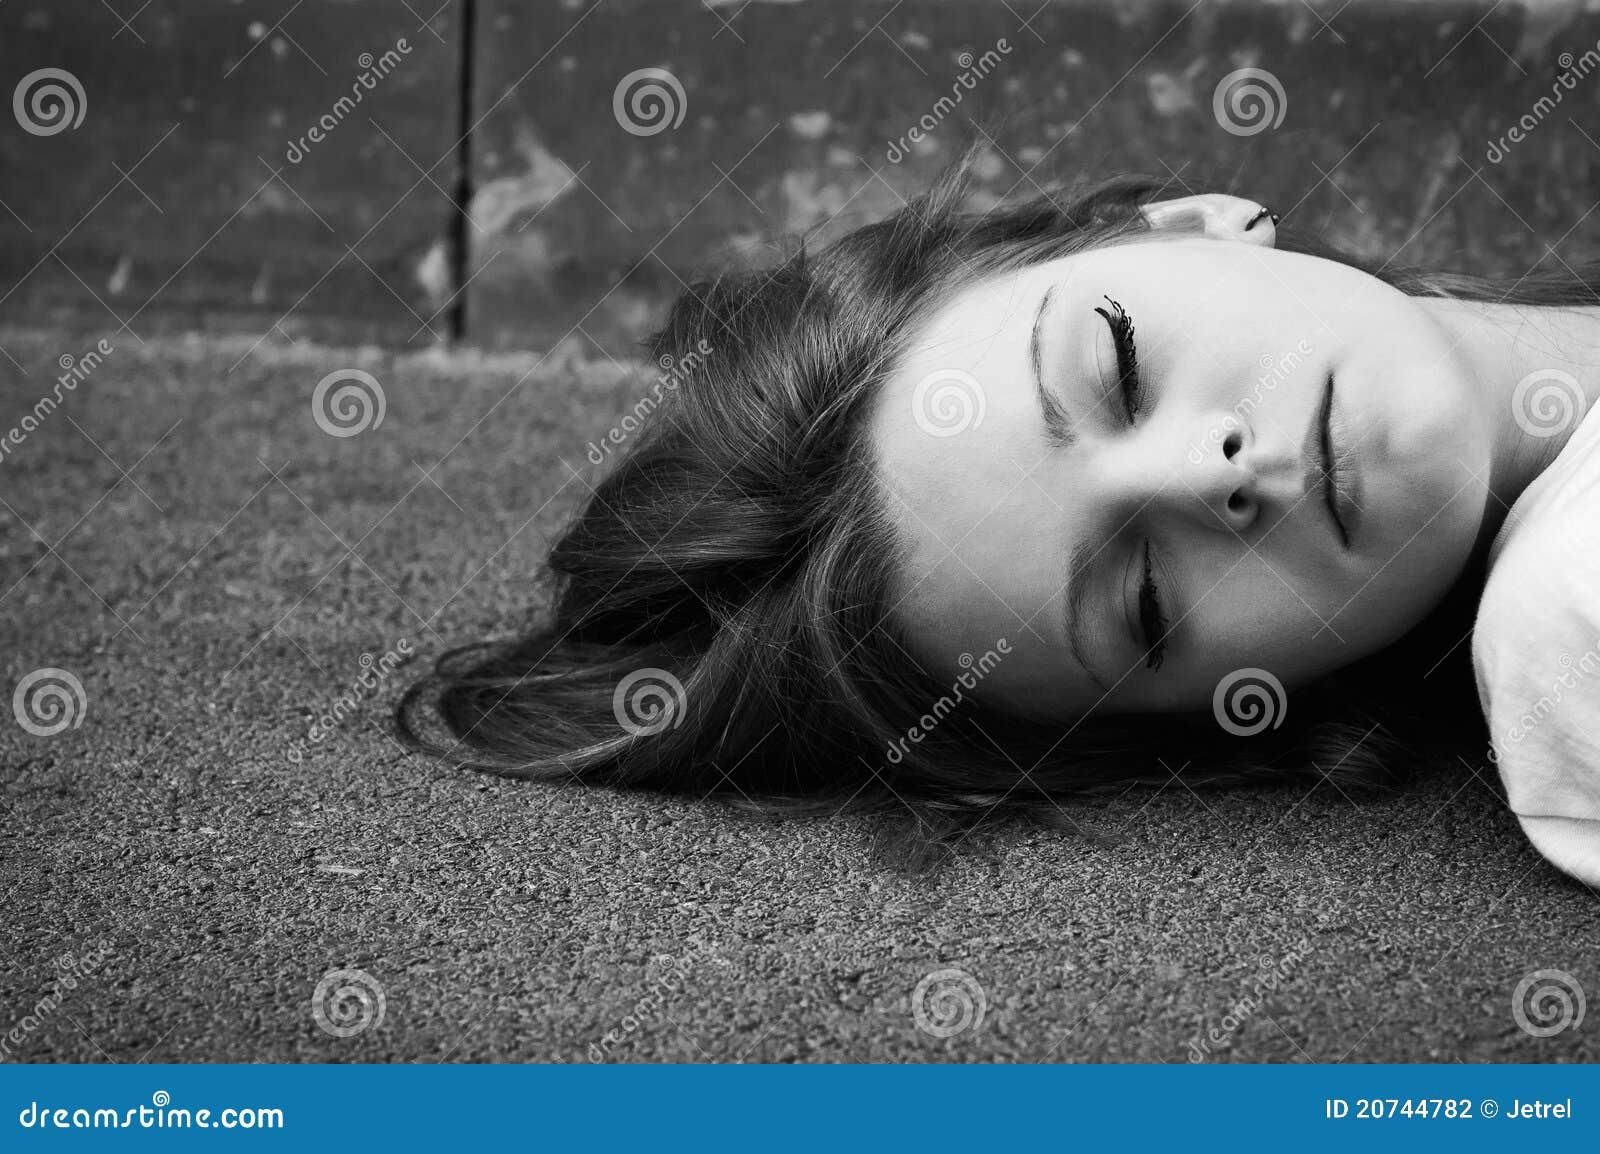 Download Sleeping Young Girl Lying On Asphalt Stock Photo - Image of model, lovely: 20744782